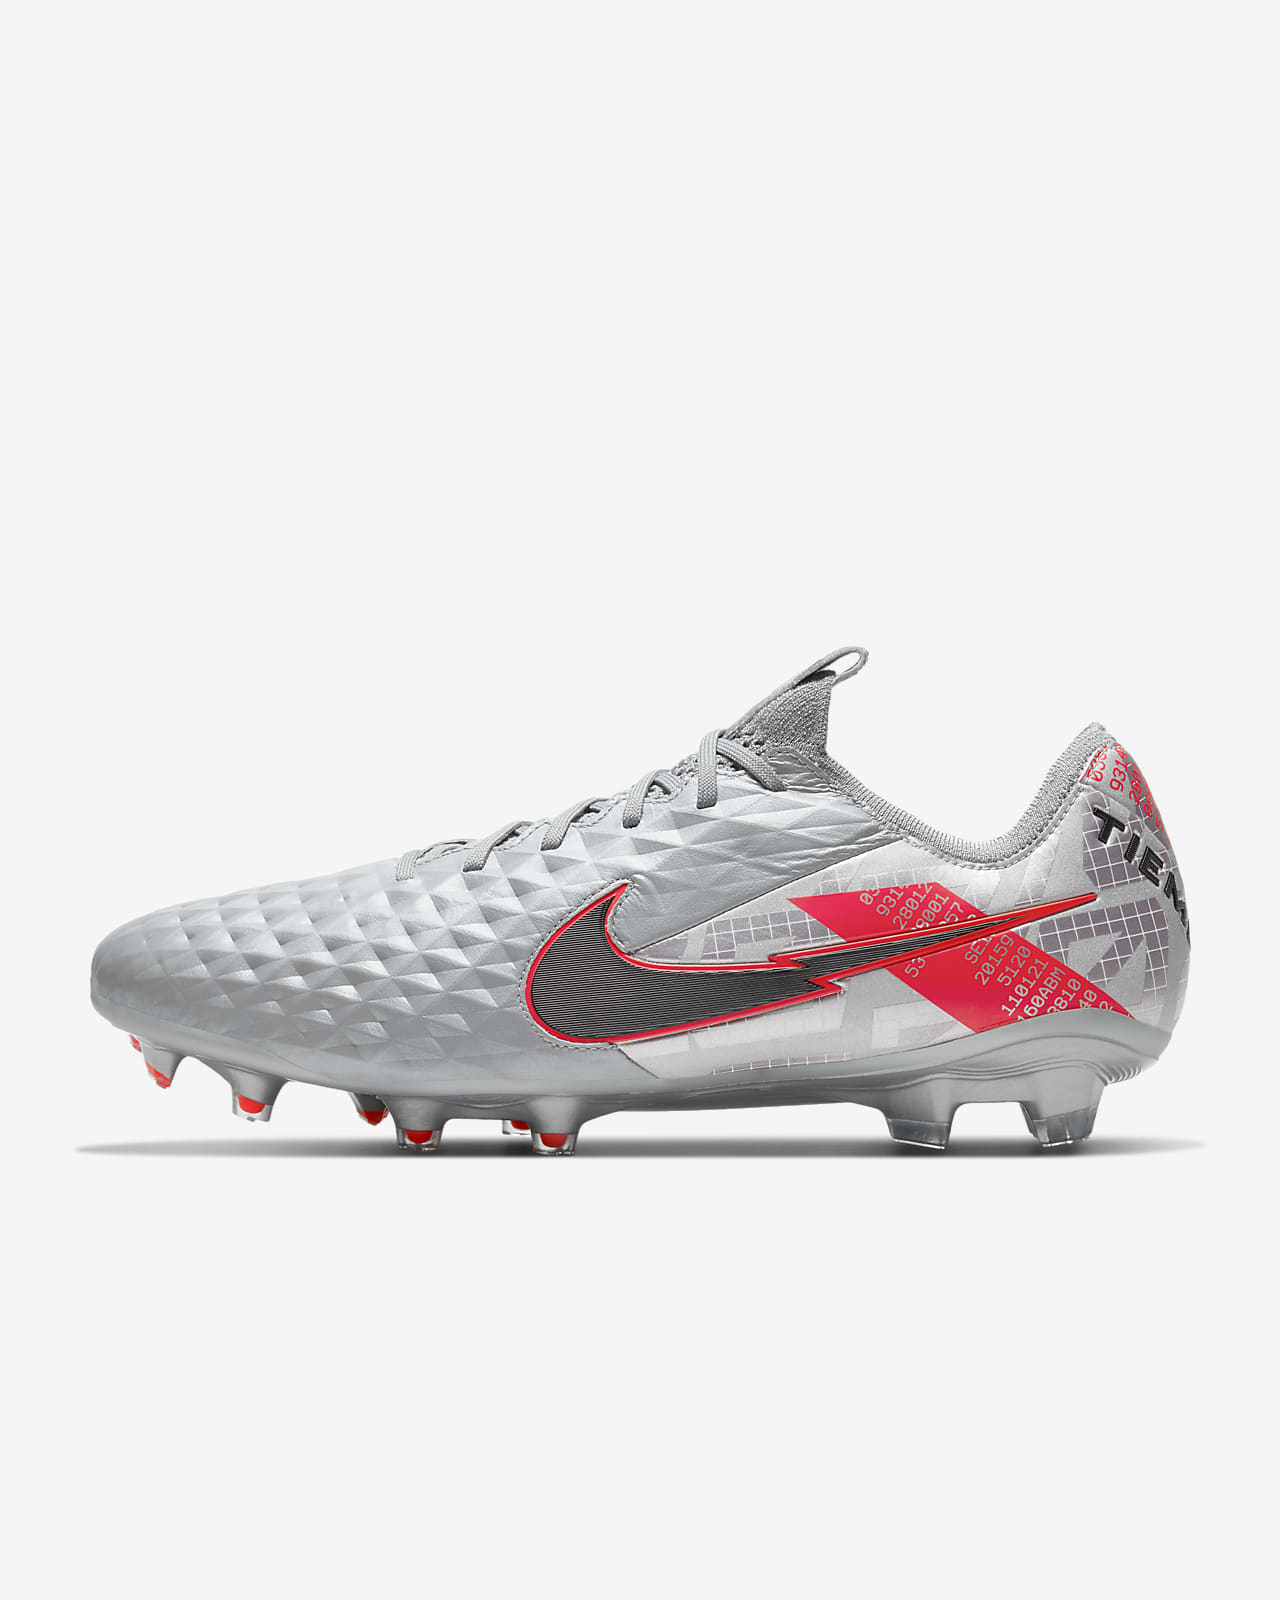 Ceder Enderezar Globo  Nike Tiempo Legend 8 Elite FG Firm-Ground Soccer Cleat. Nike JP